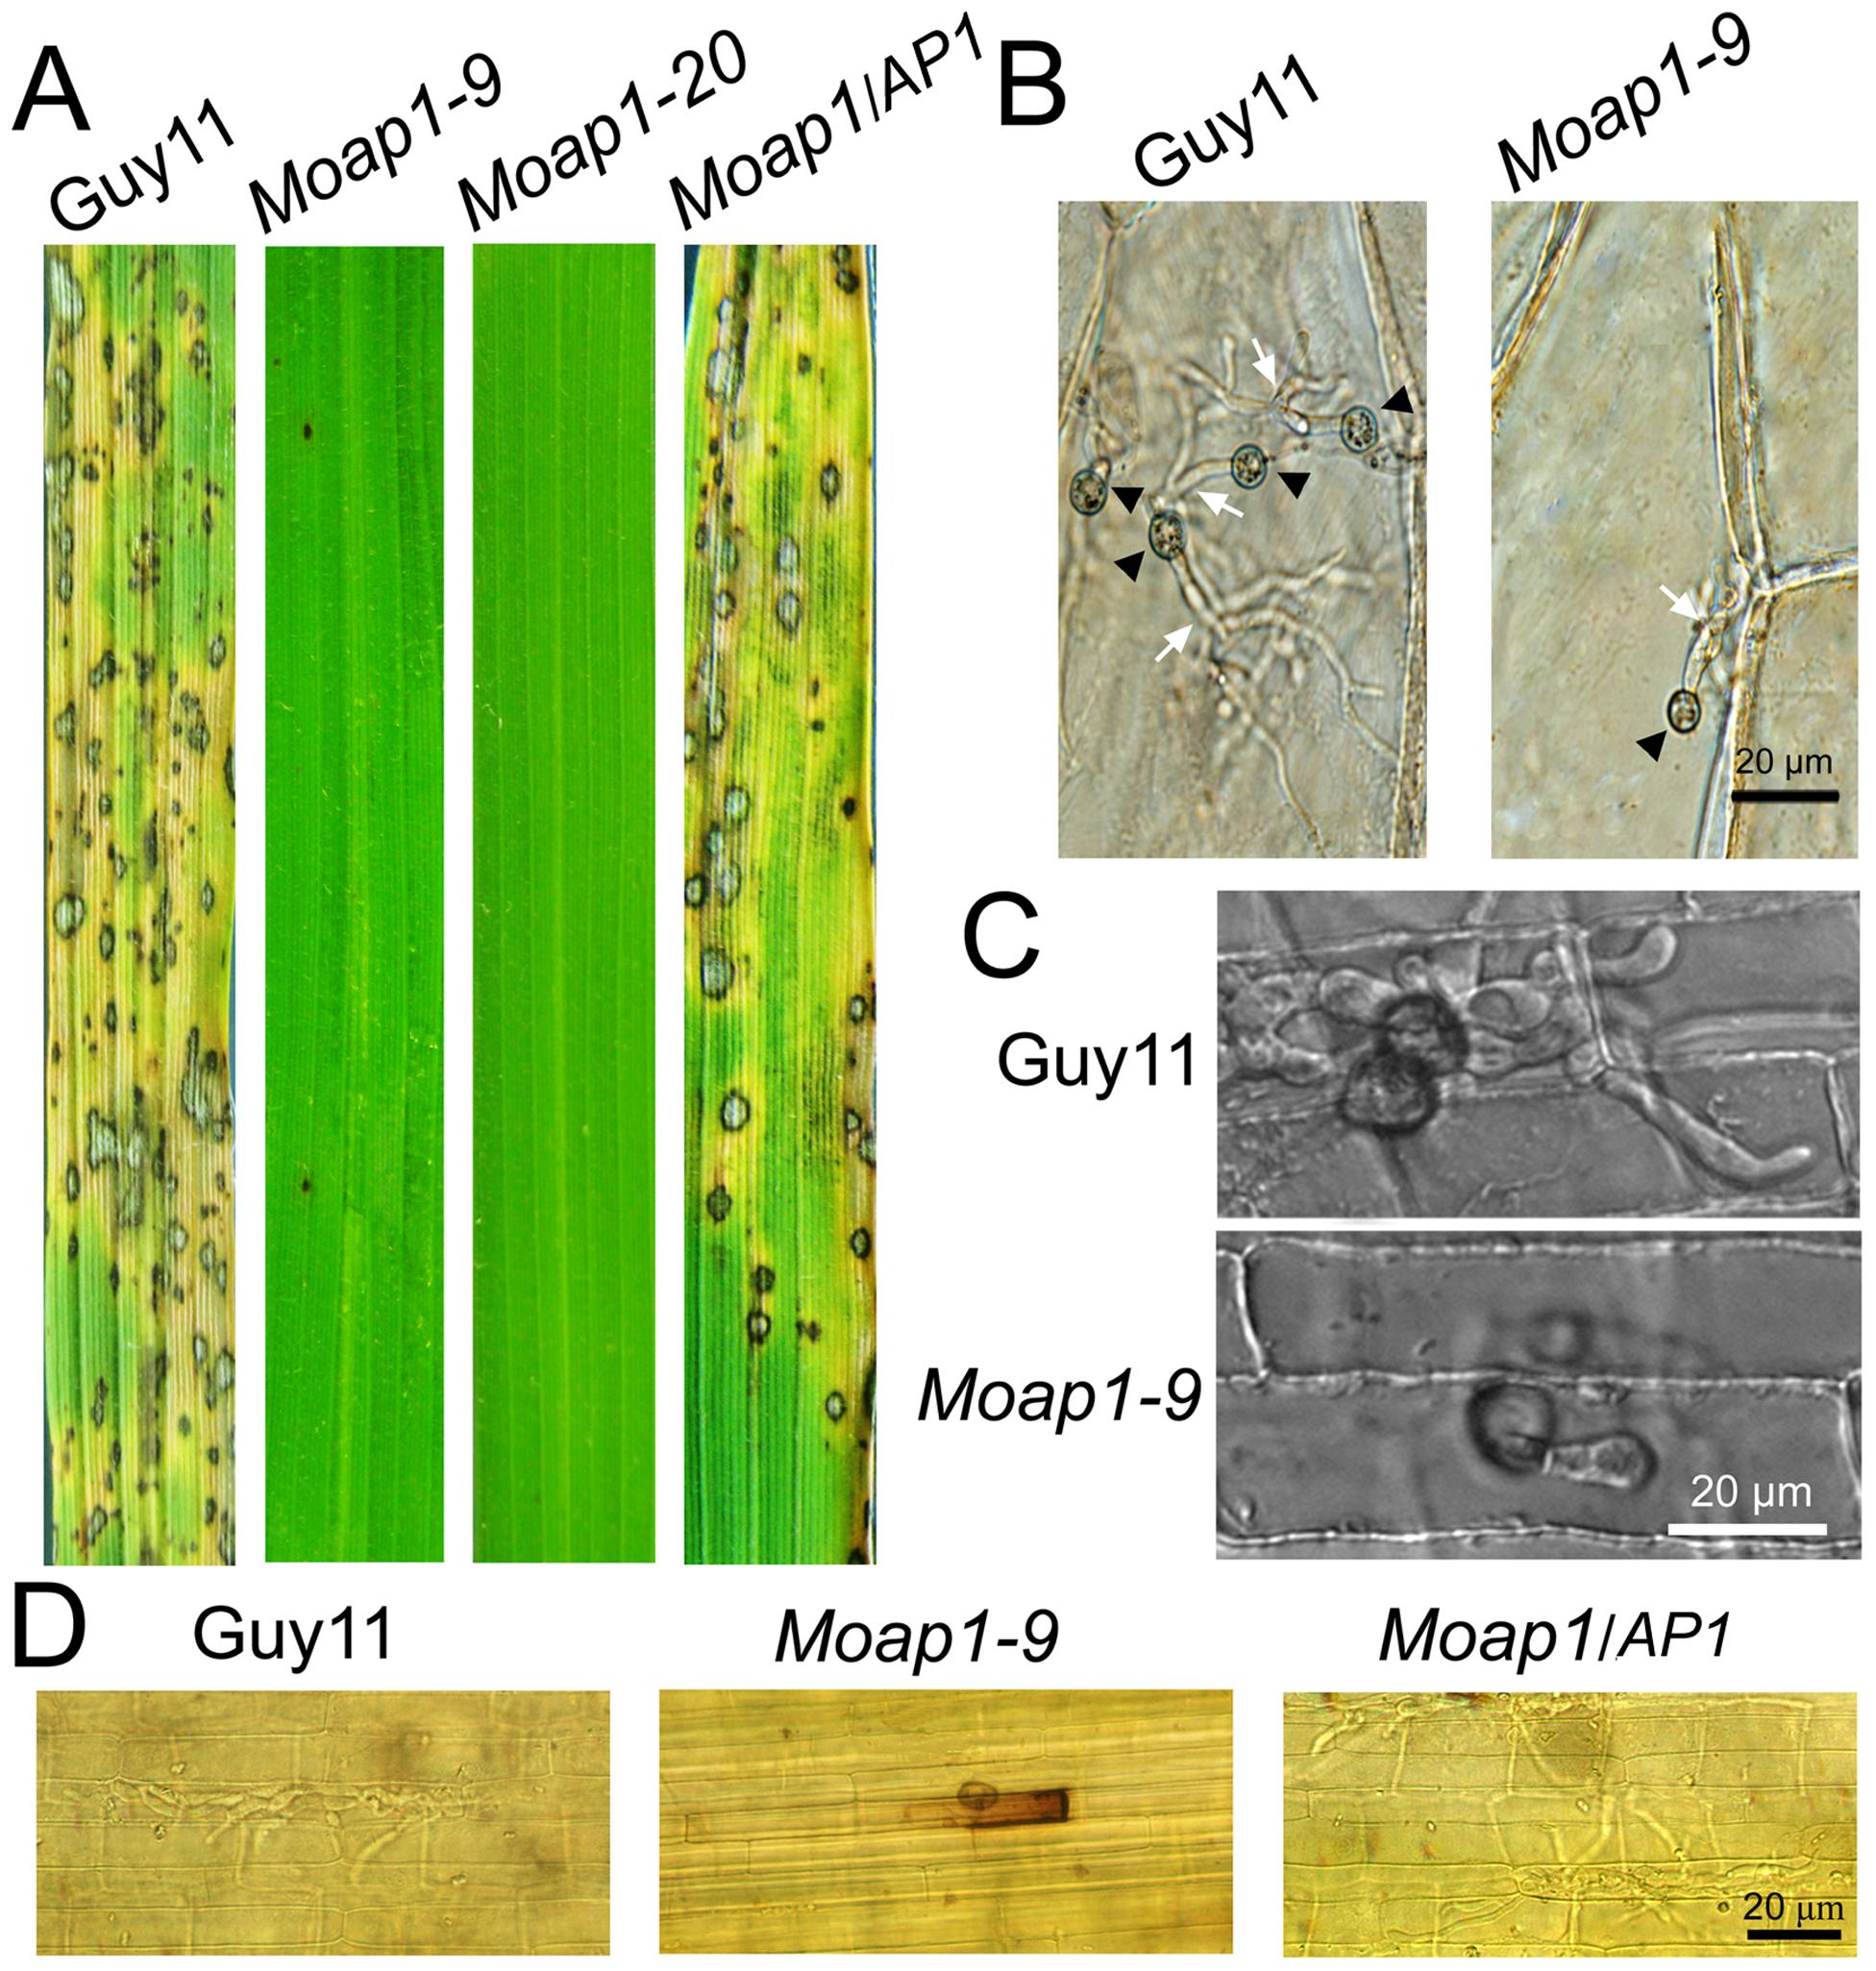 Pathogenicity of the <i>Moap1</i> mutant strain.